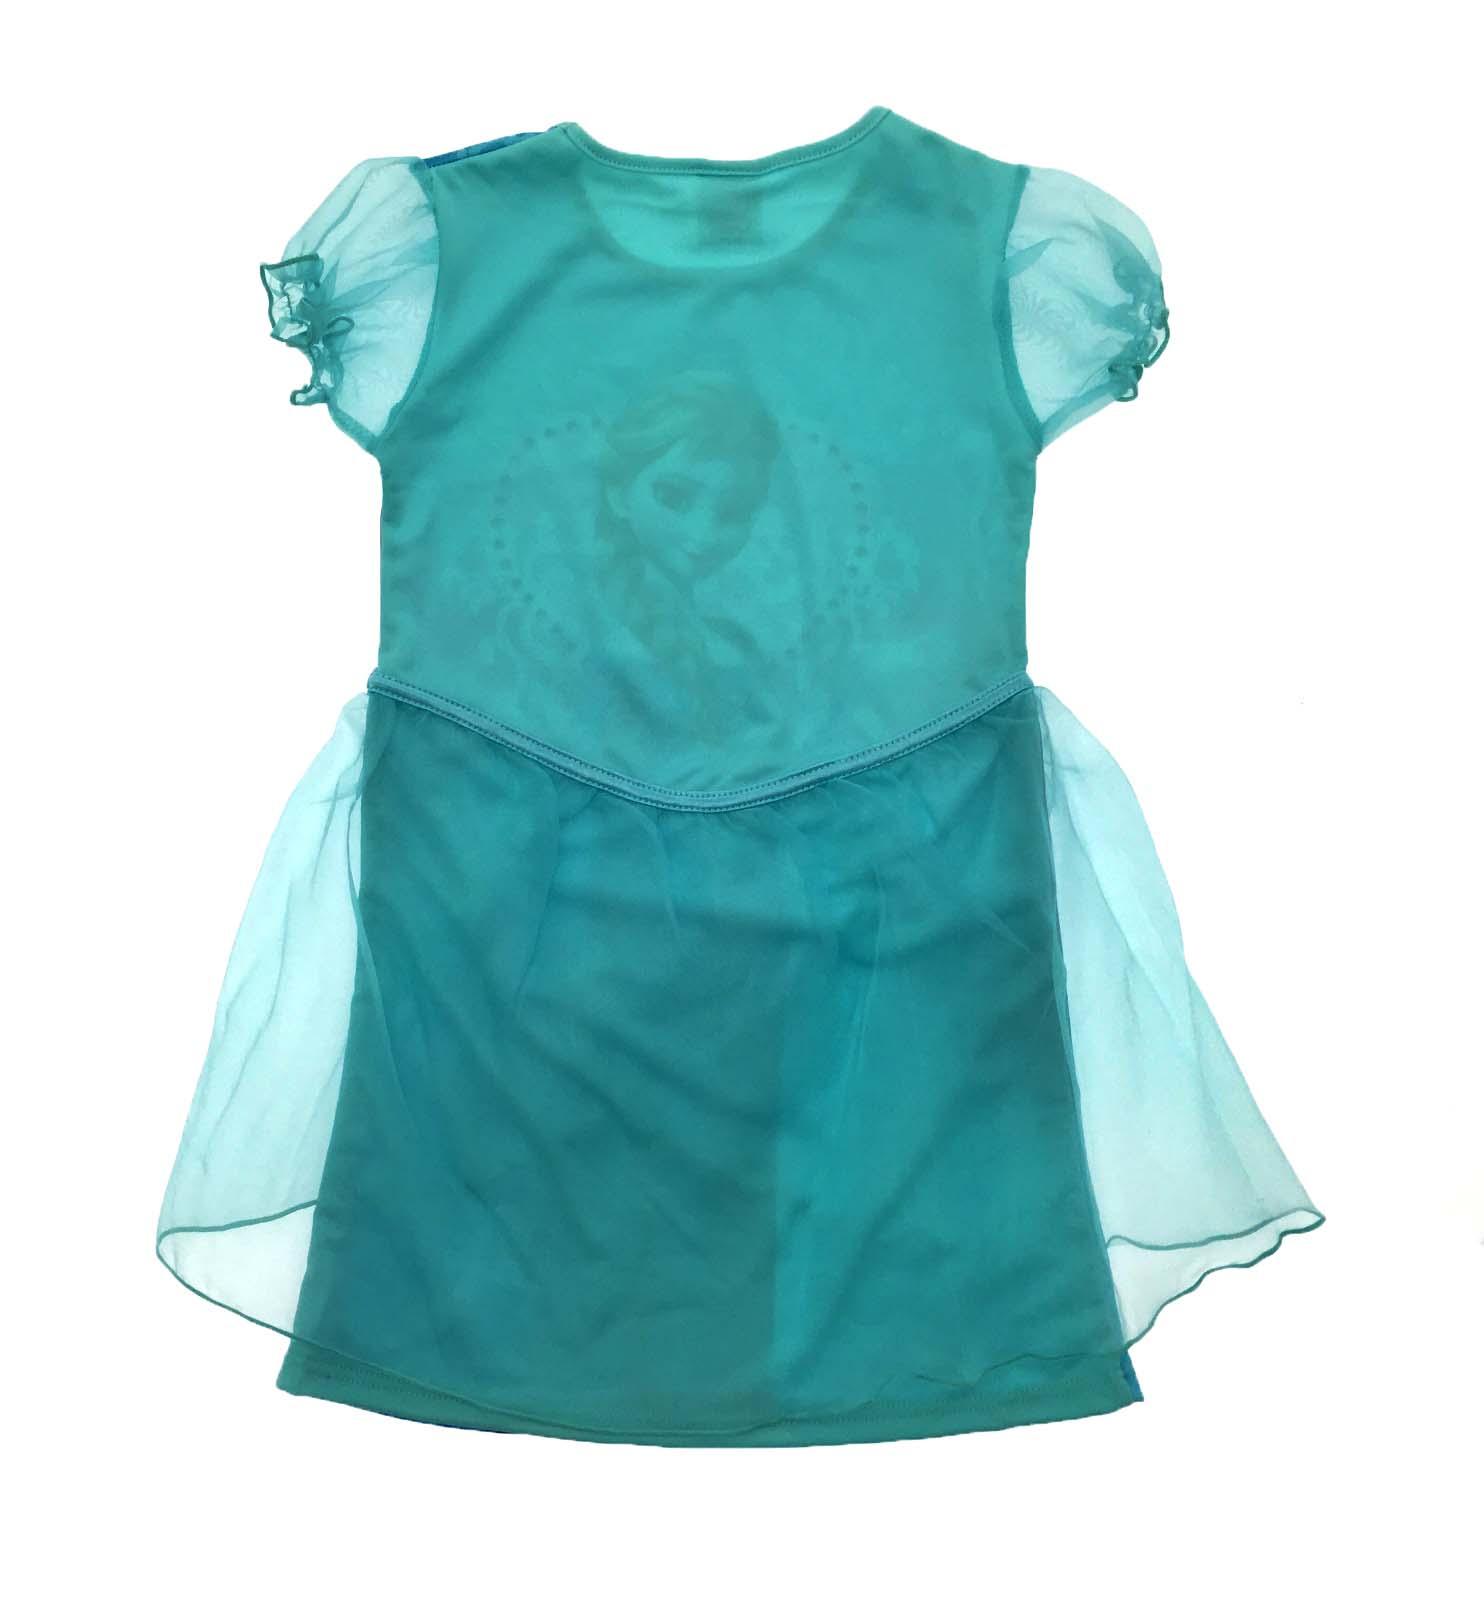 SALE Girls Disney Princess Dress Up Costume Fancy Dress Party Outfit ...